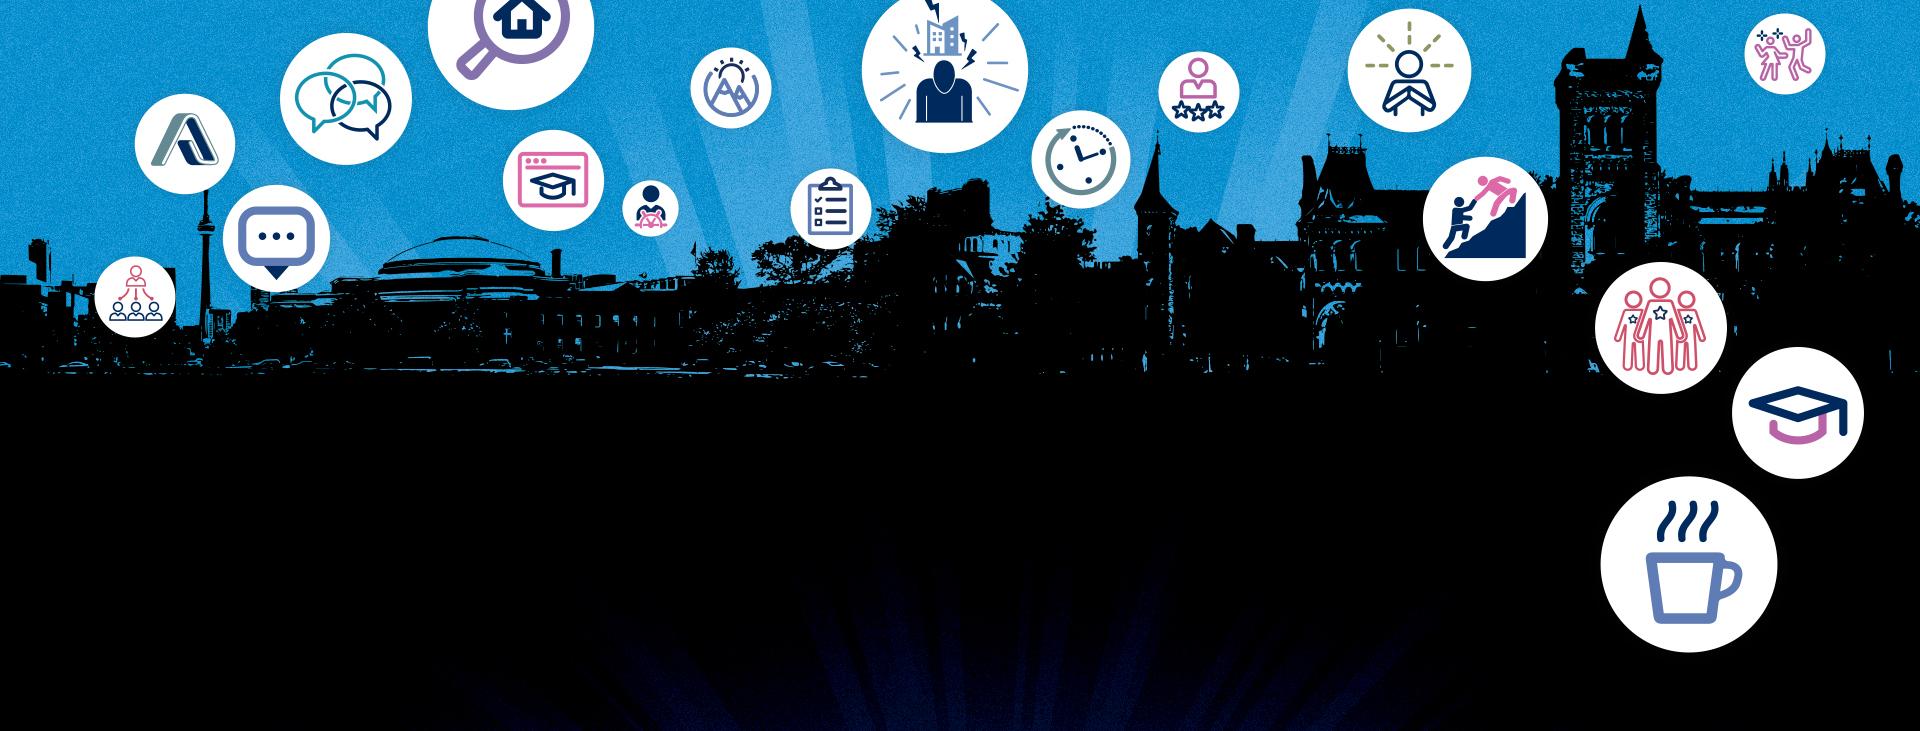 Illustrated campus skyline